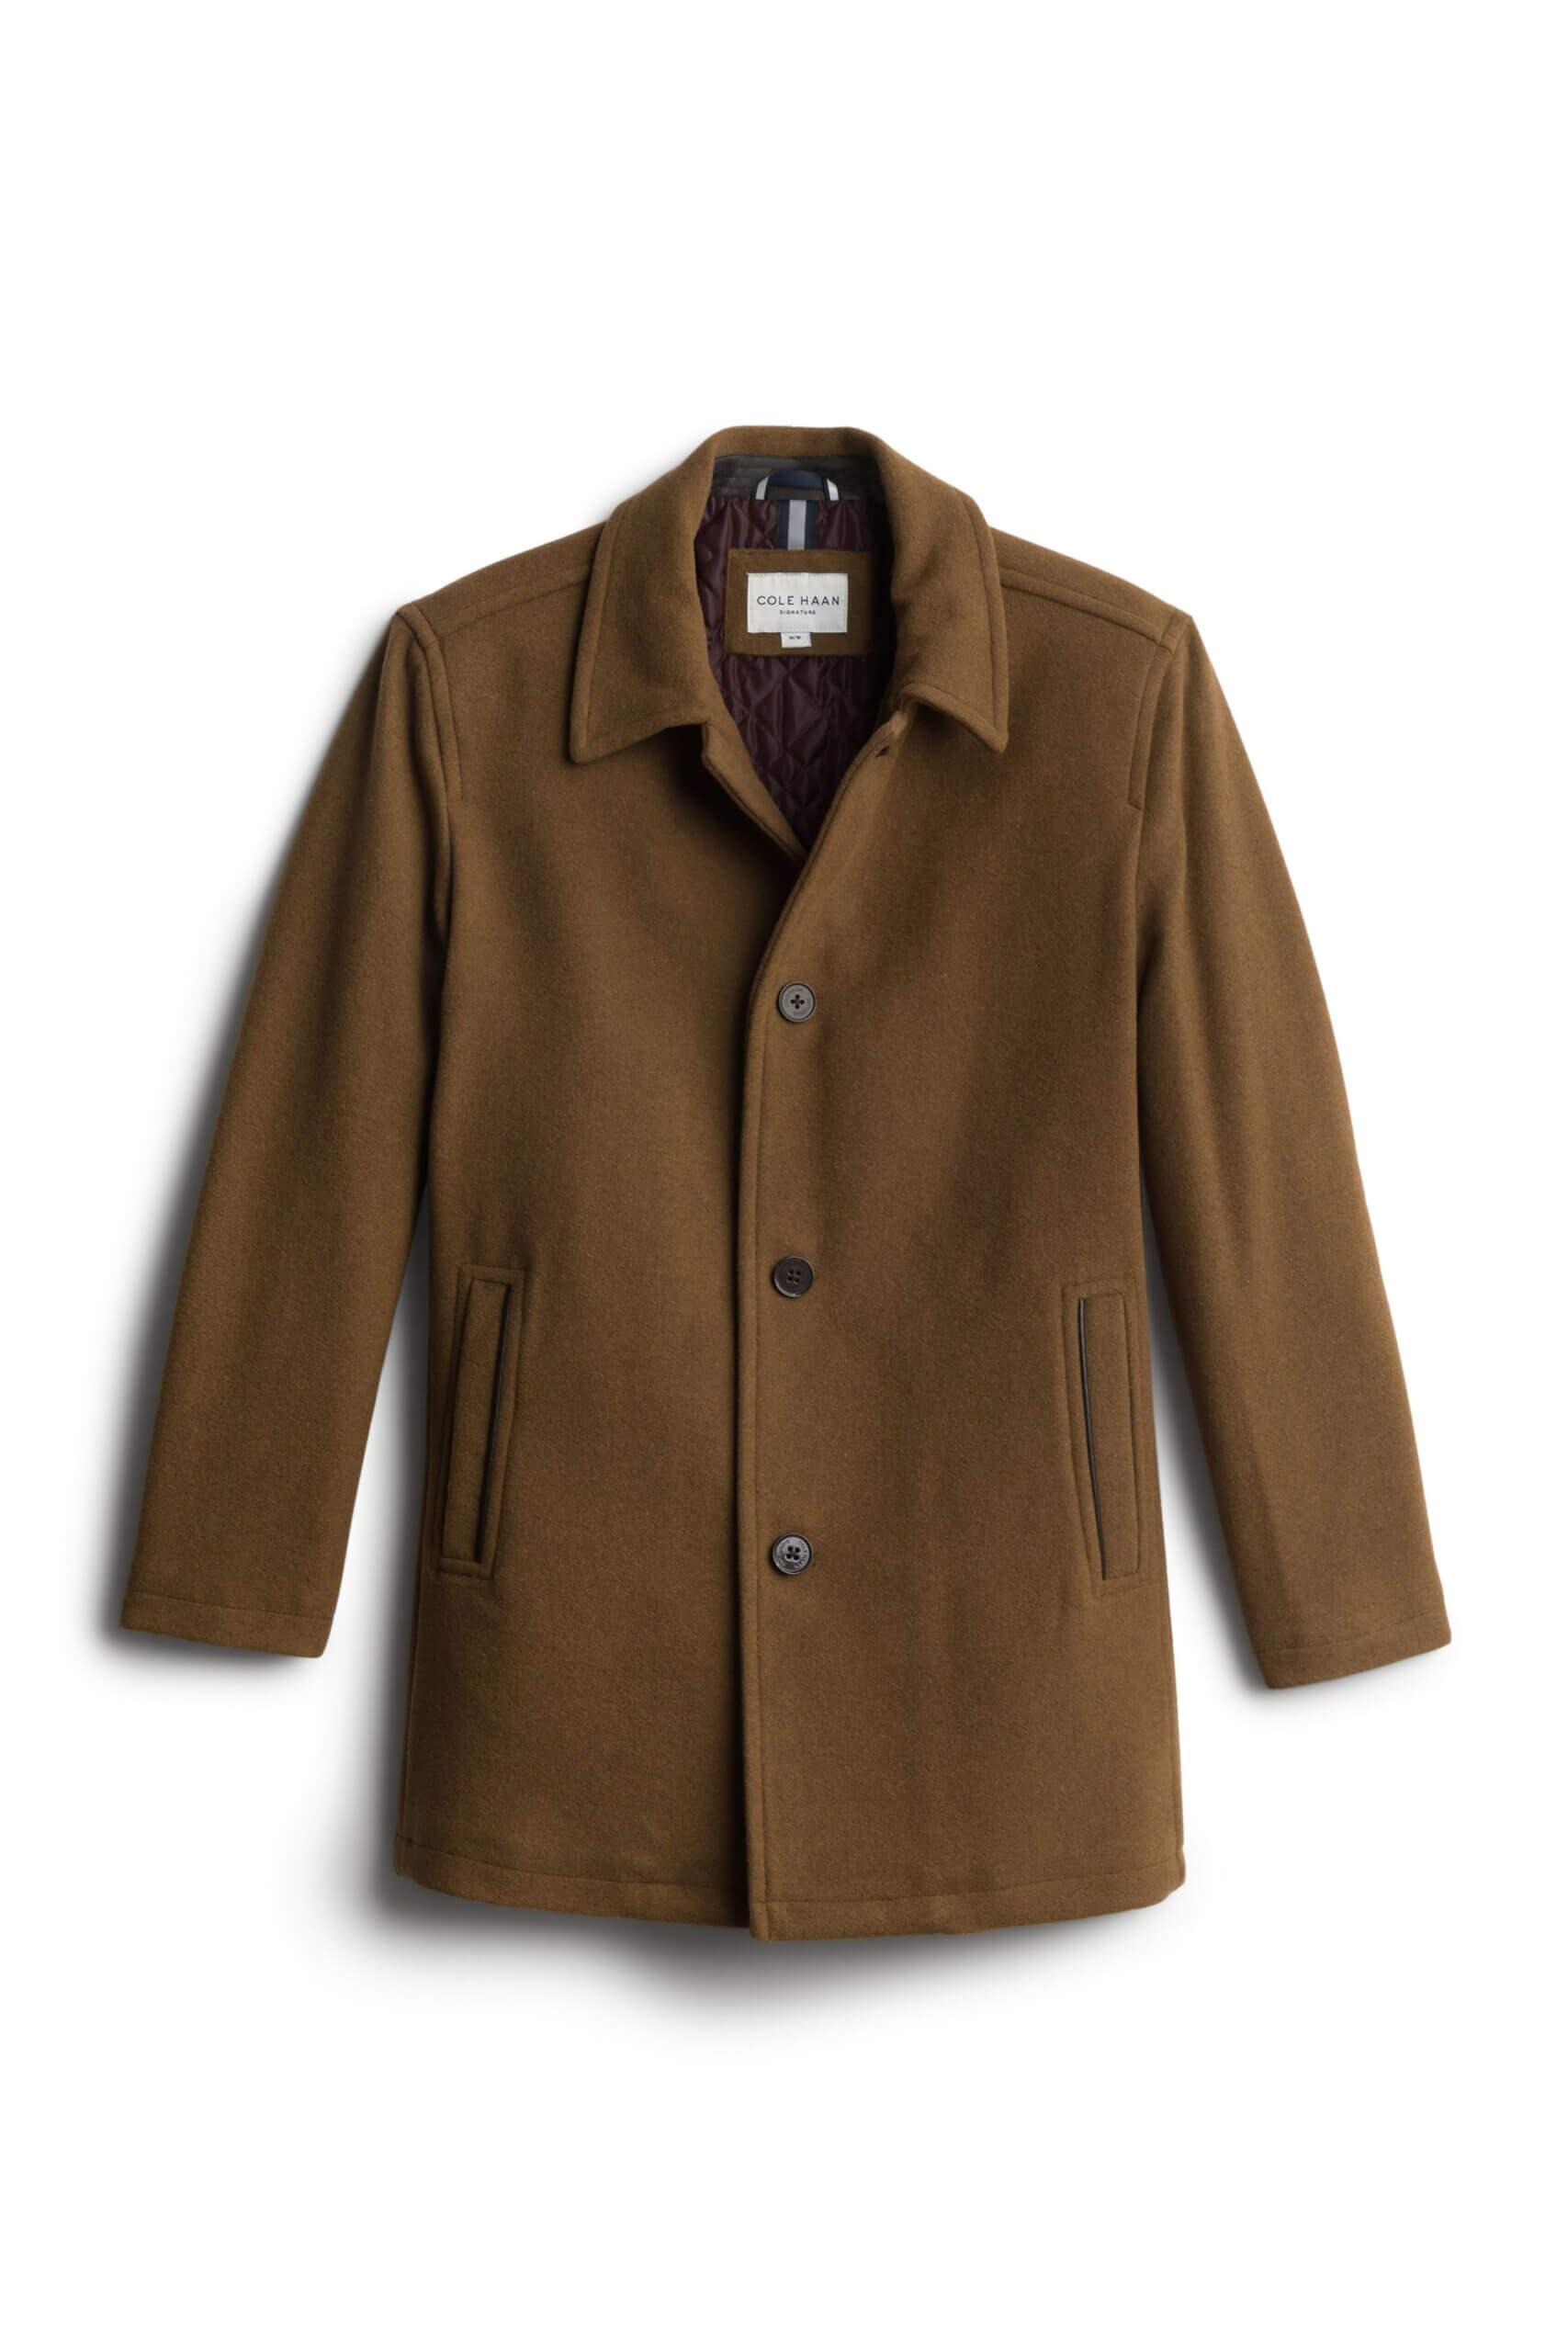 Stitch Fix men's brown wool car coat.